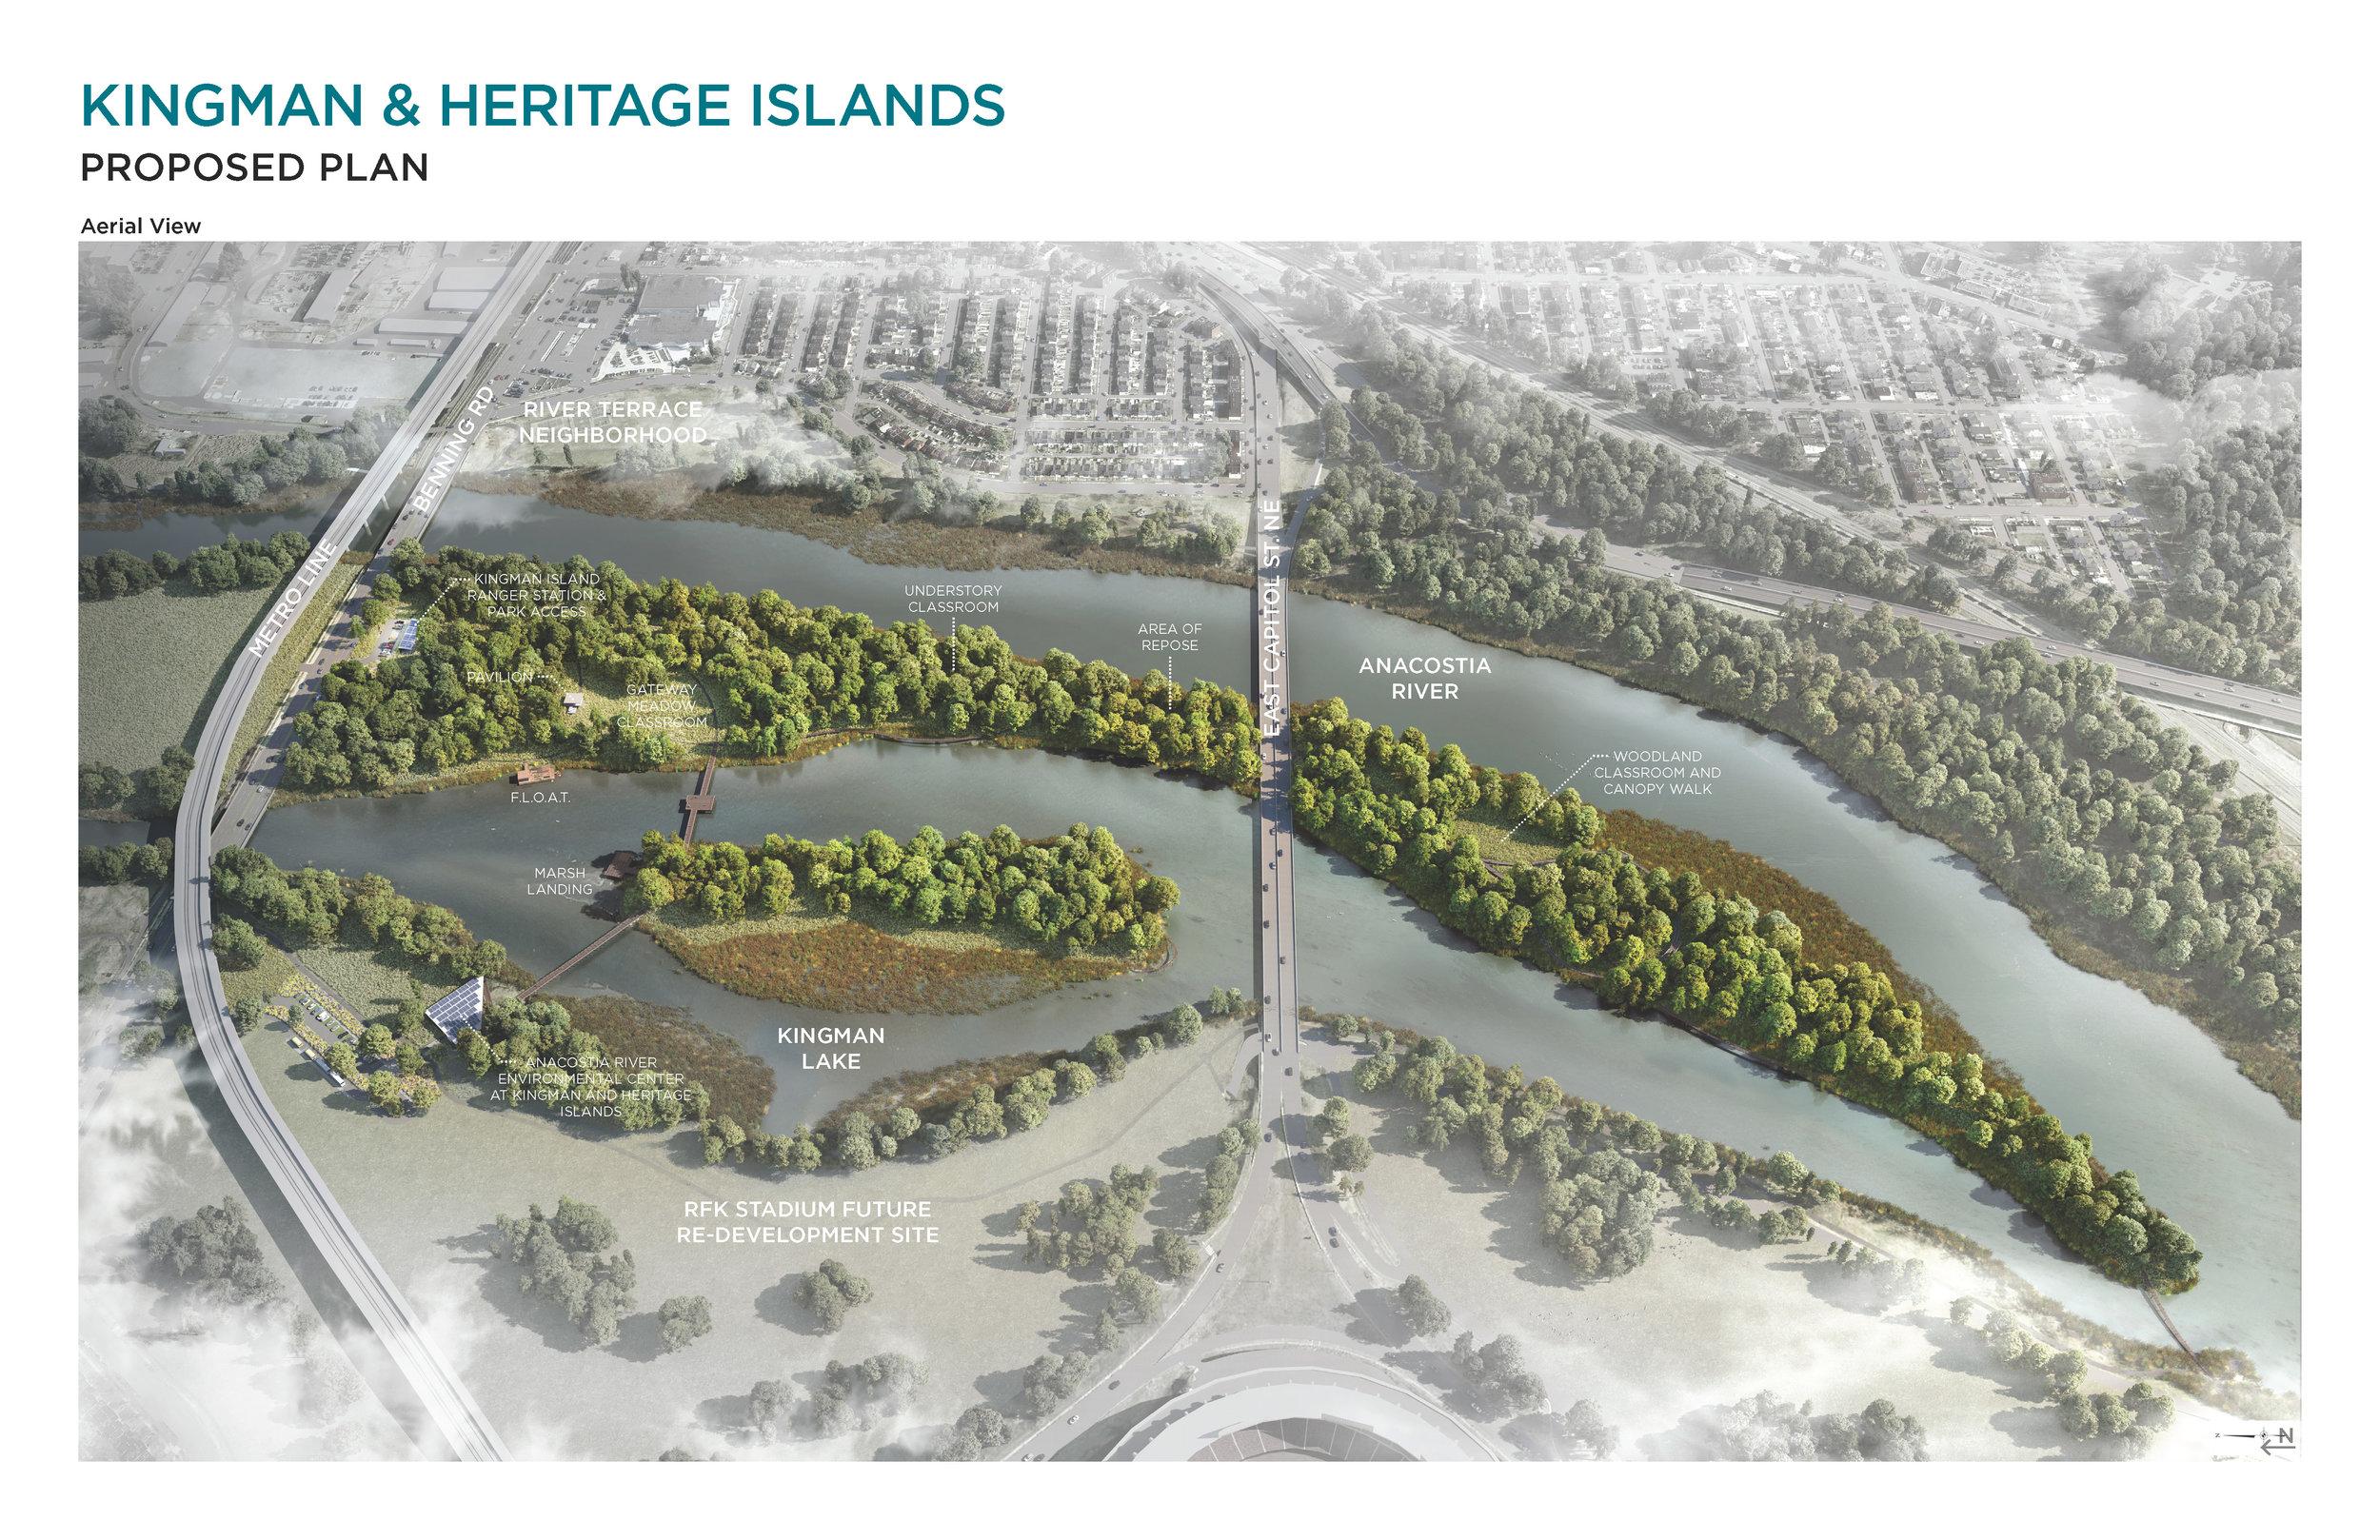 Image taken from DOEE's 2017  Kingman Island & Heritage Island Planning & Feasibility Study